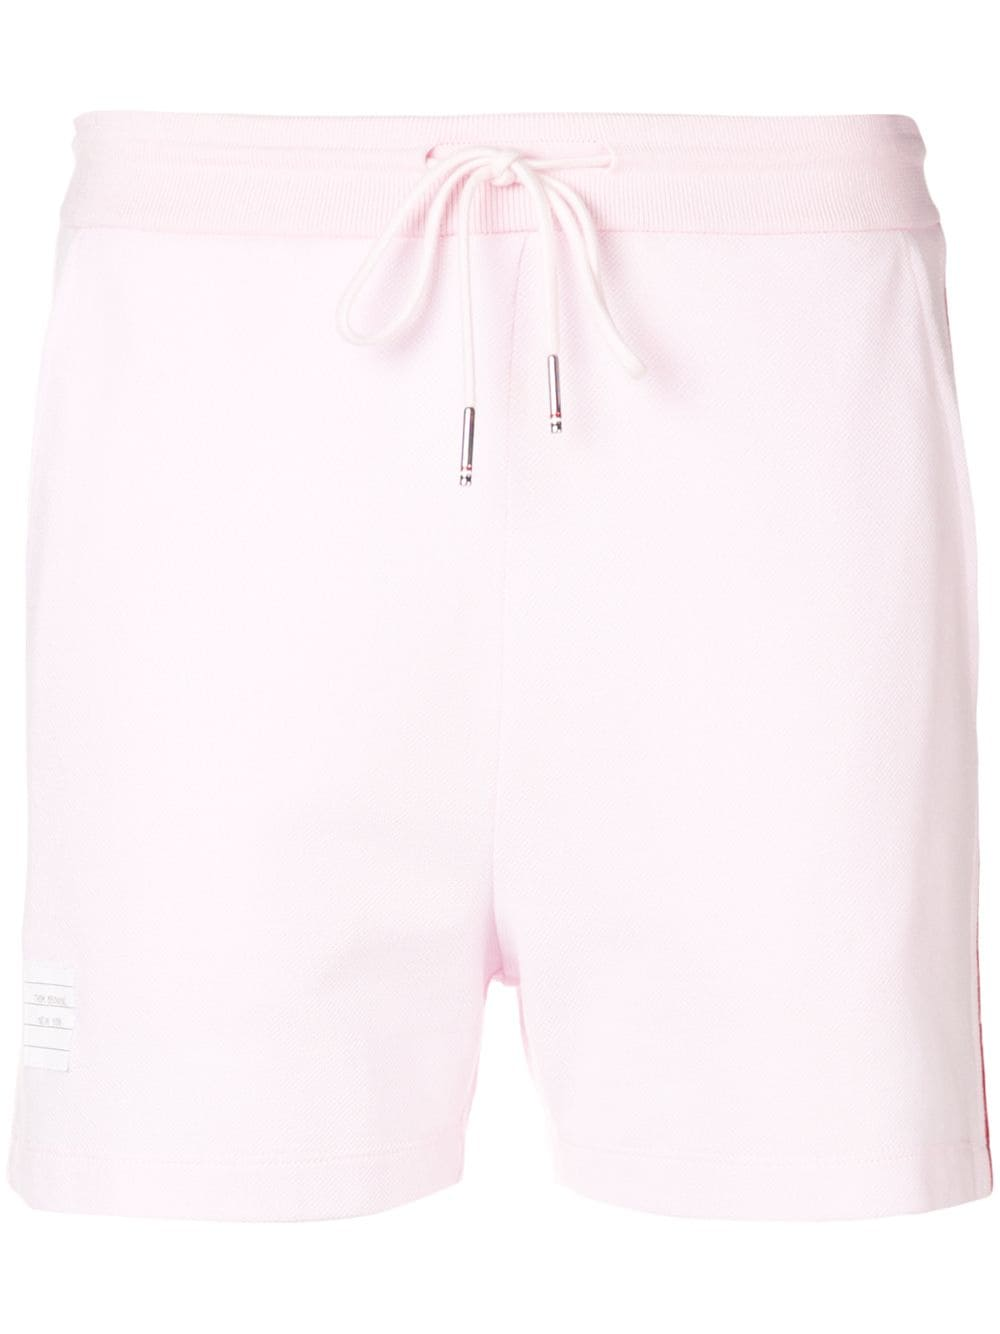 Thom Browne 'Rwb' Shorts - Rosa